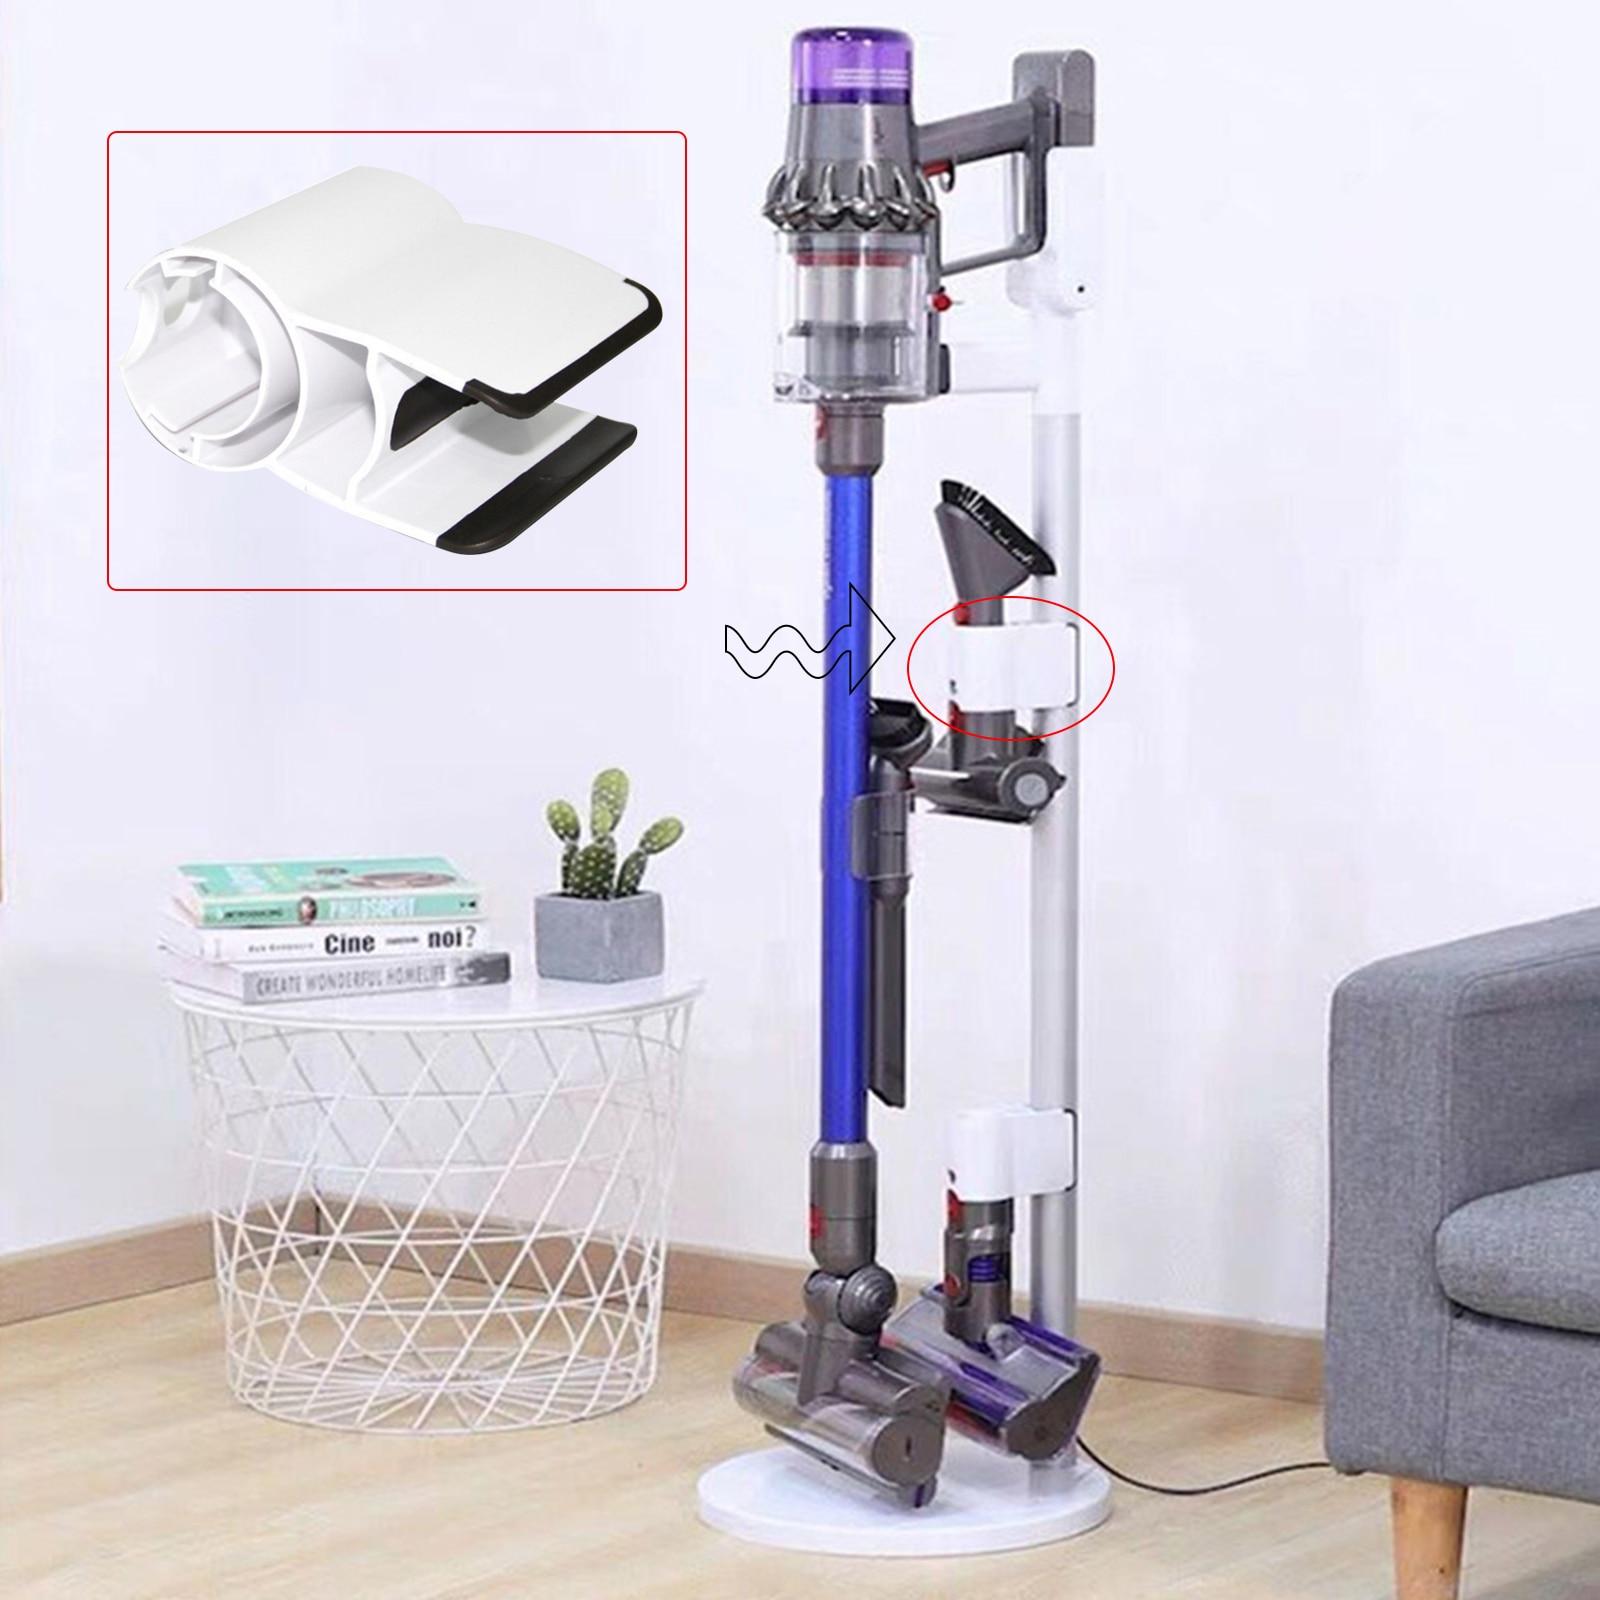 Vacuum Cleaner Brush Head Clip Tube Clamp for Dyson V7 V8 V10 V11 Wireless Vacuum Cleaner Holder Attachment aspirador Accessory